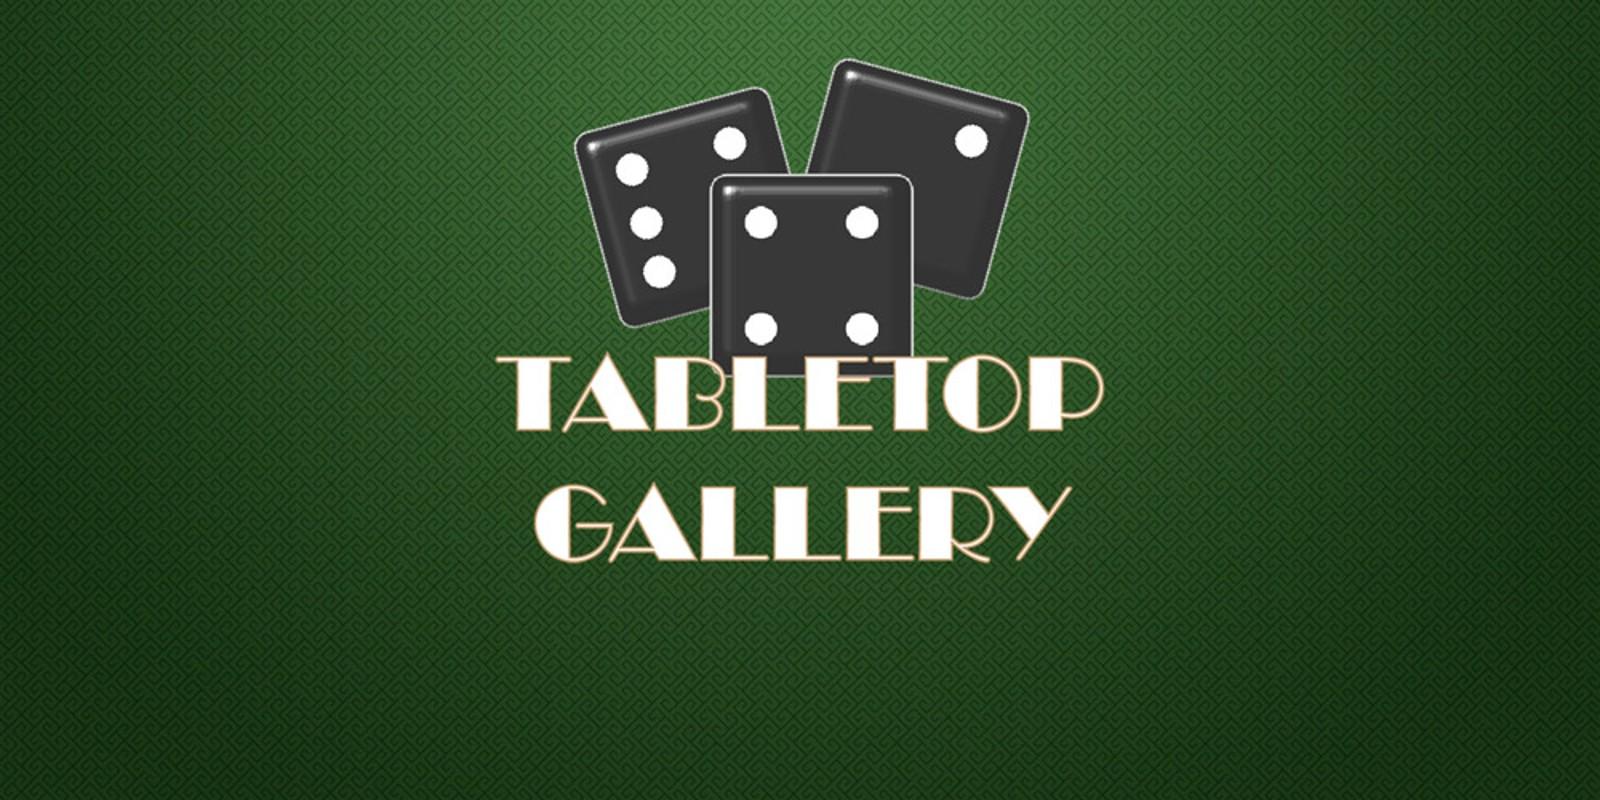 Poker dice solitaire future wii u cora cartable a roulette